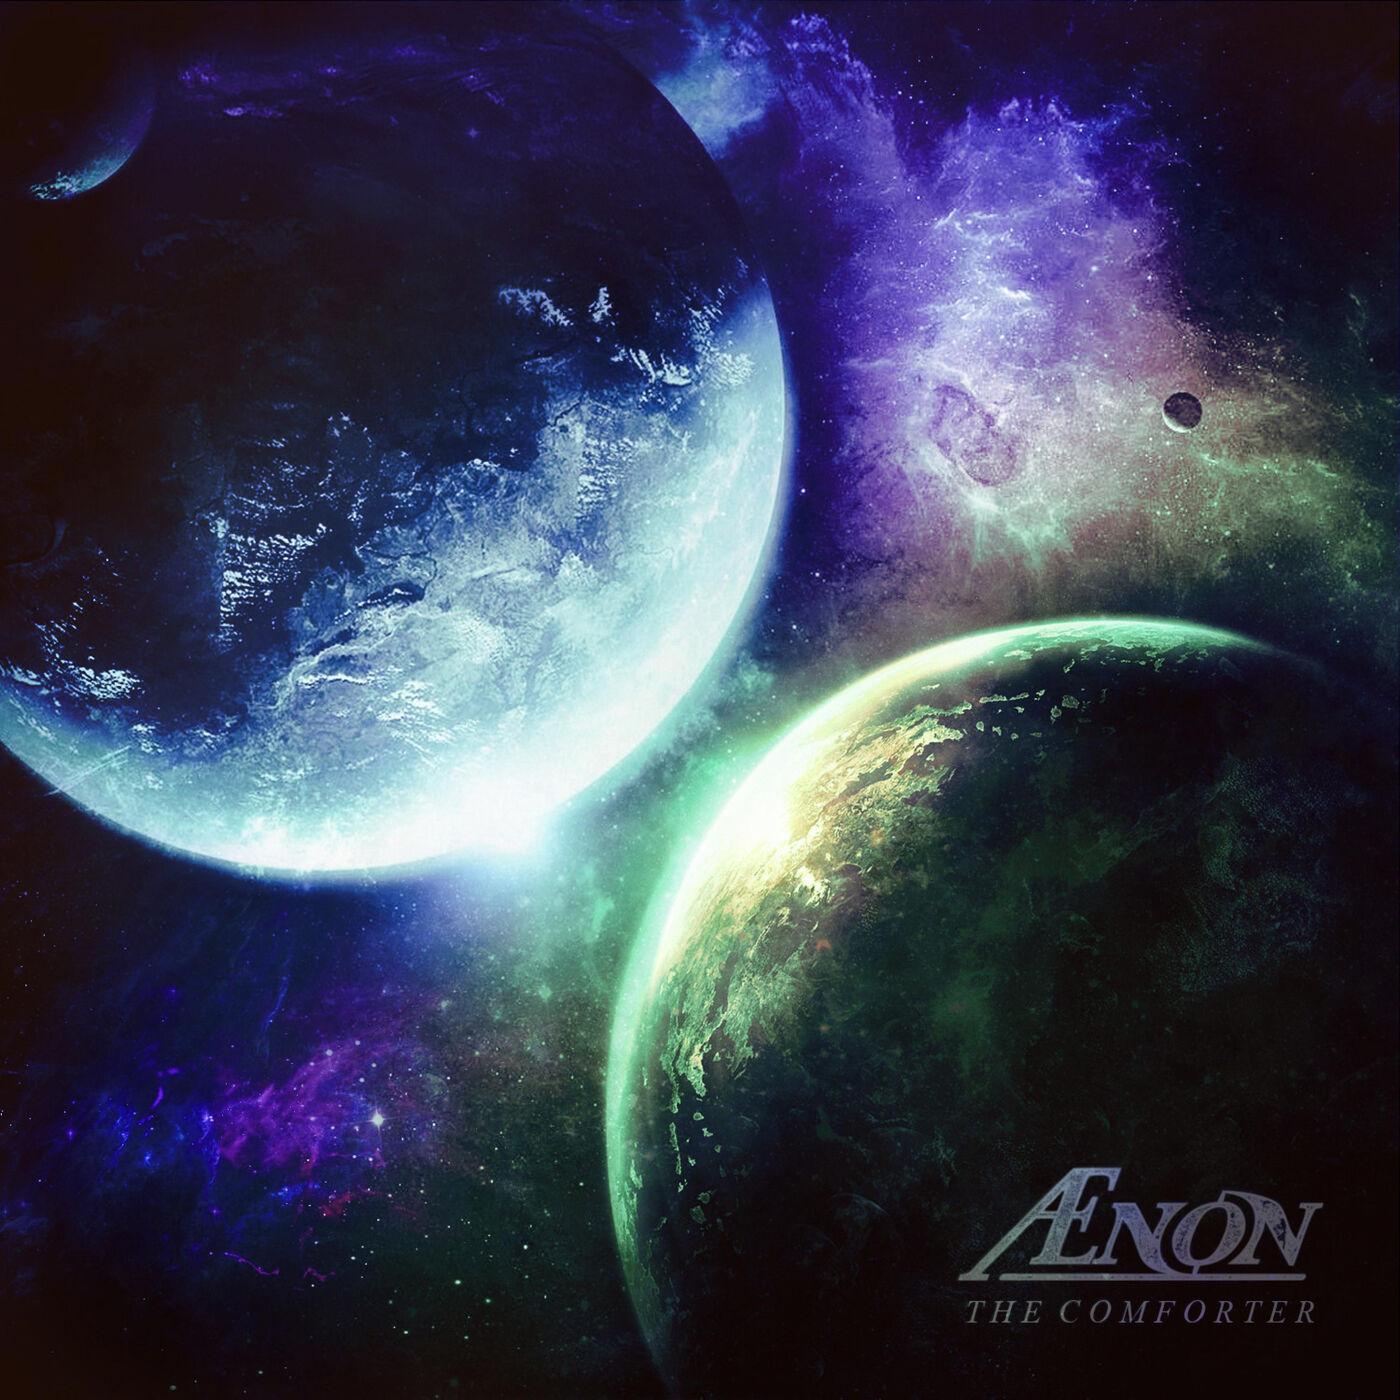 Ænon - The Comforter [EP] (2020)